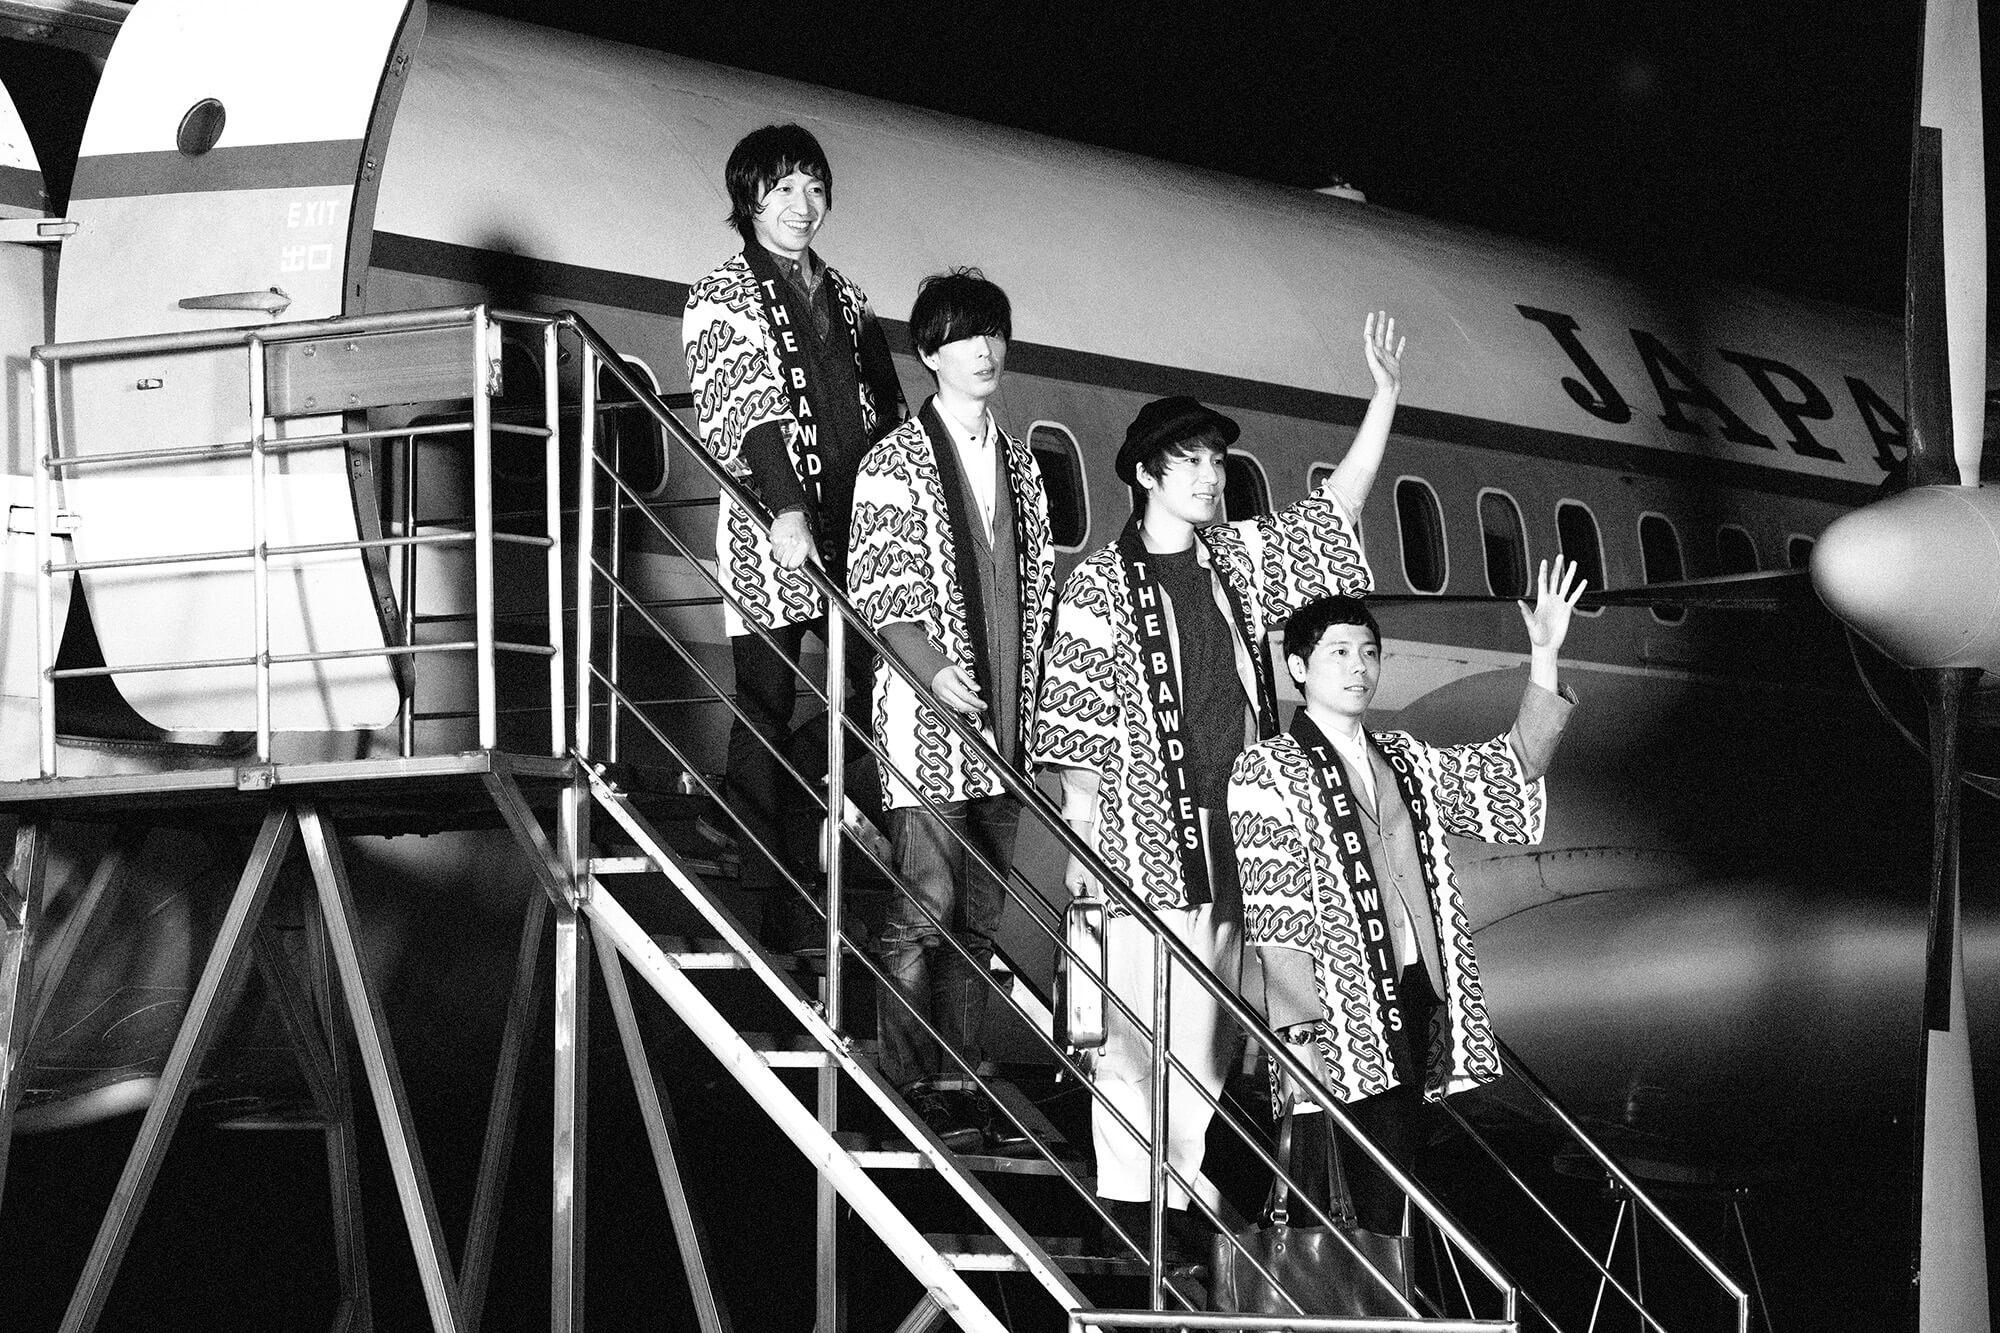 THE BAWDIES、日本武道館作品リリース記念・7都市でライブフォトパネル展決定